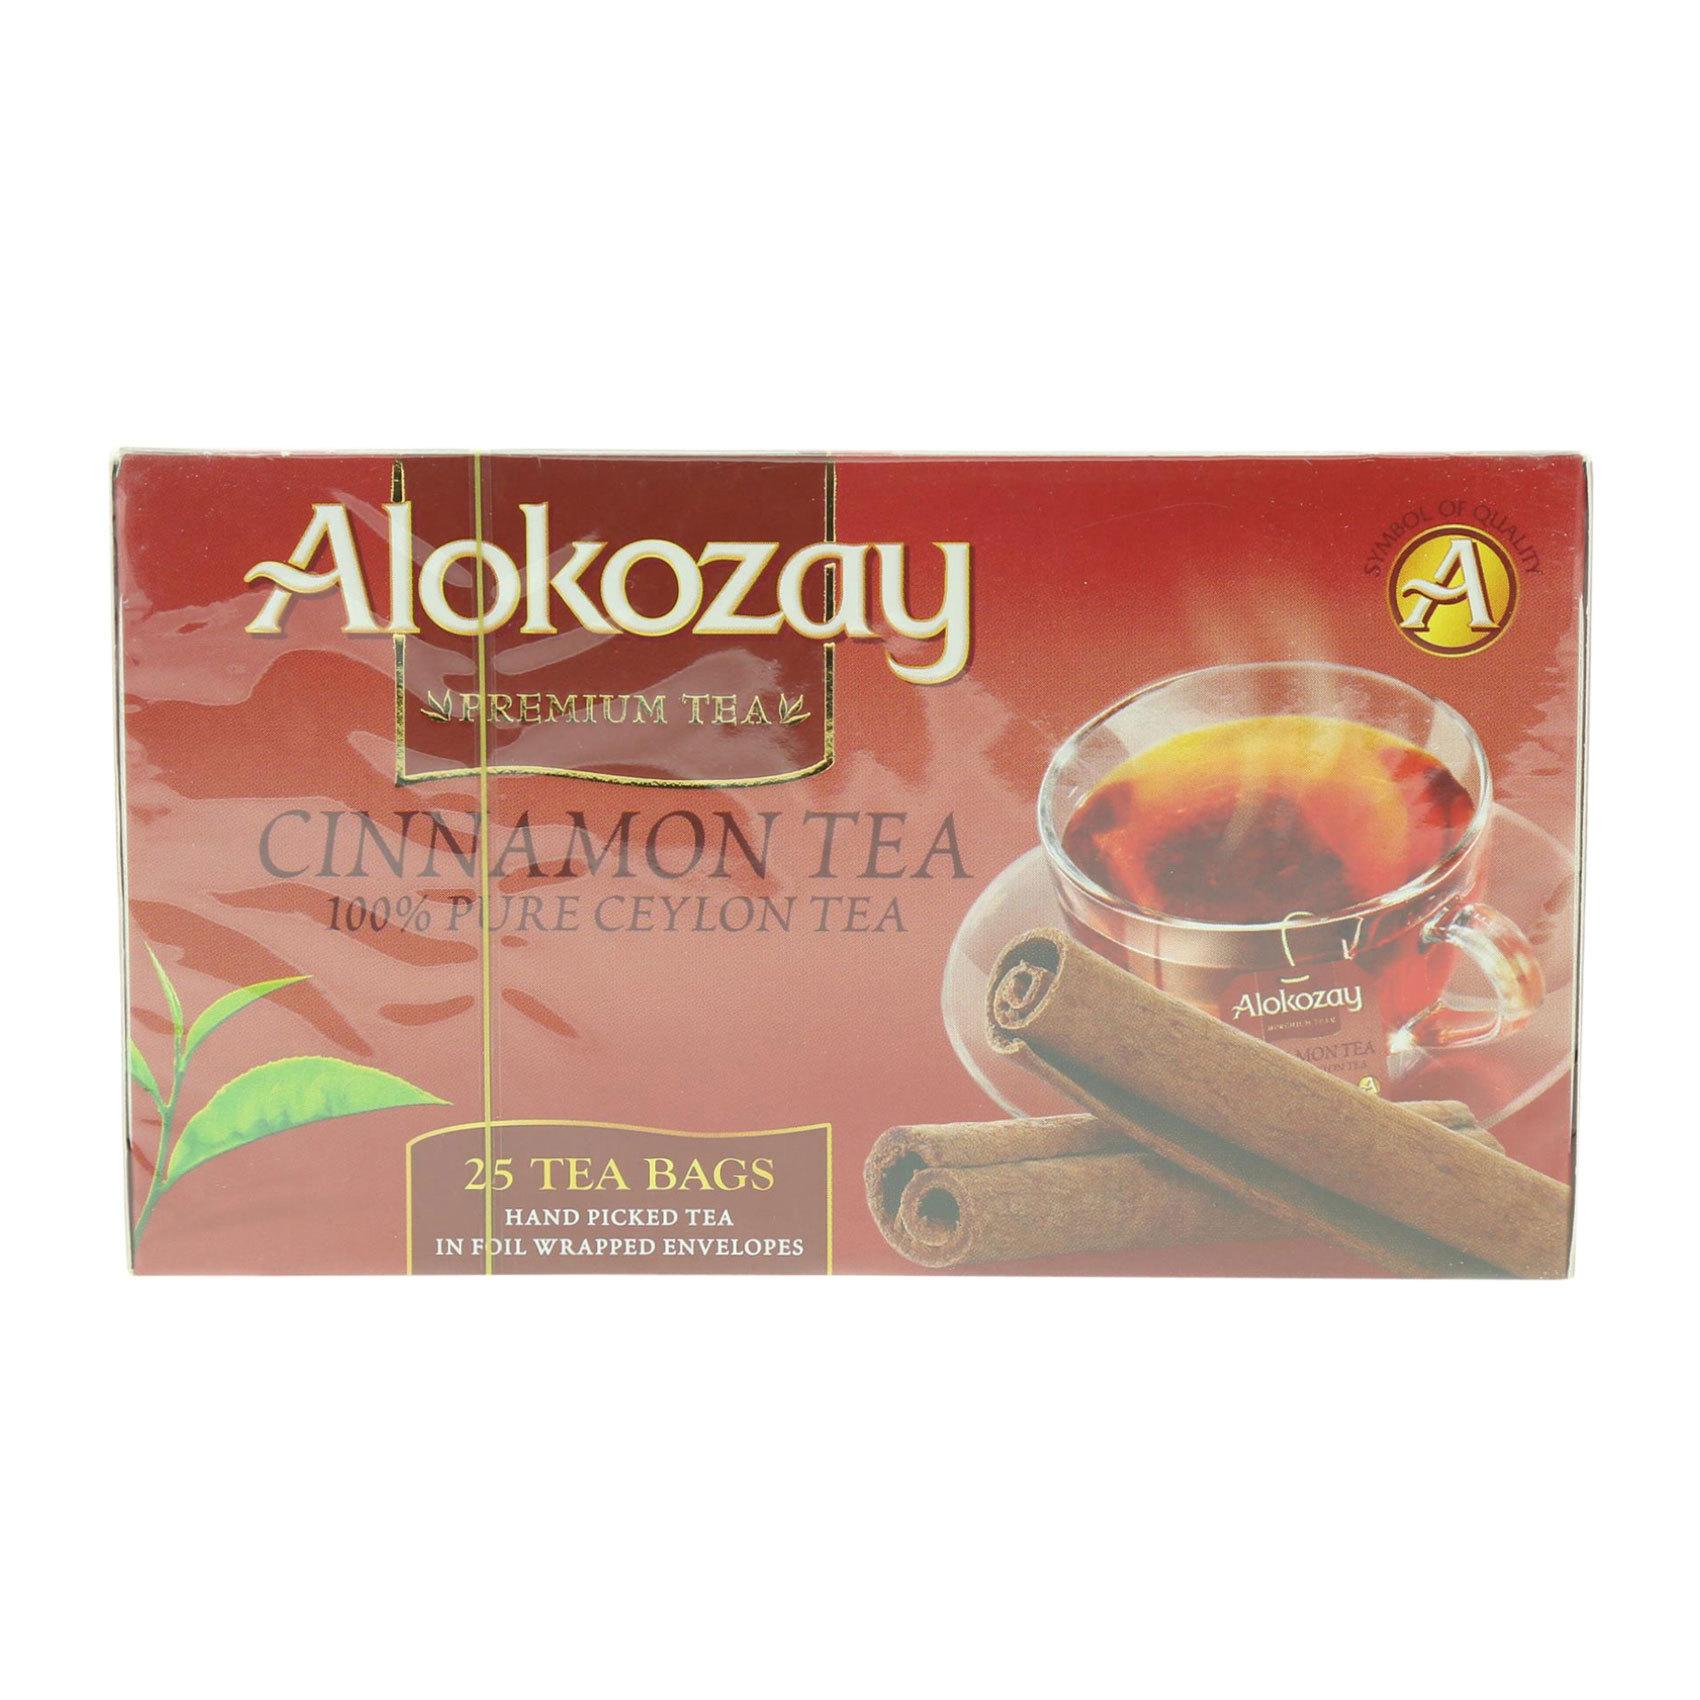 ALOKOZAY CINNAMON TEA 25'S 50G